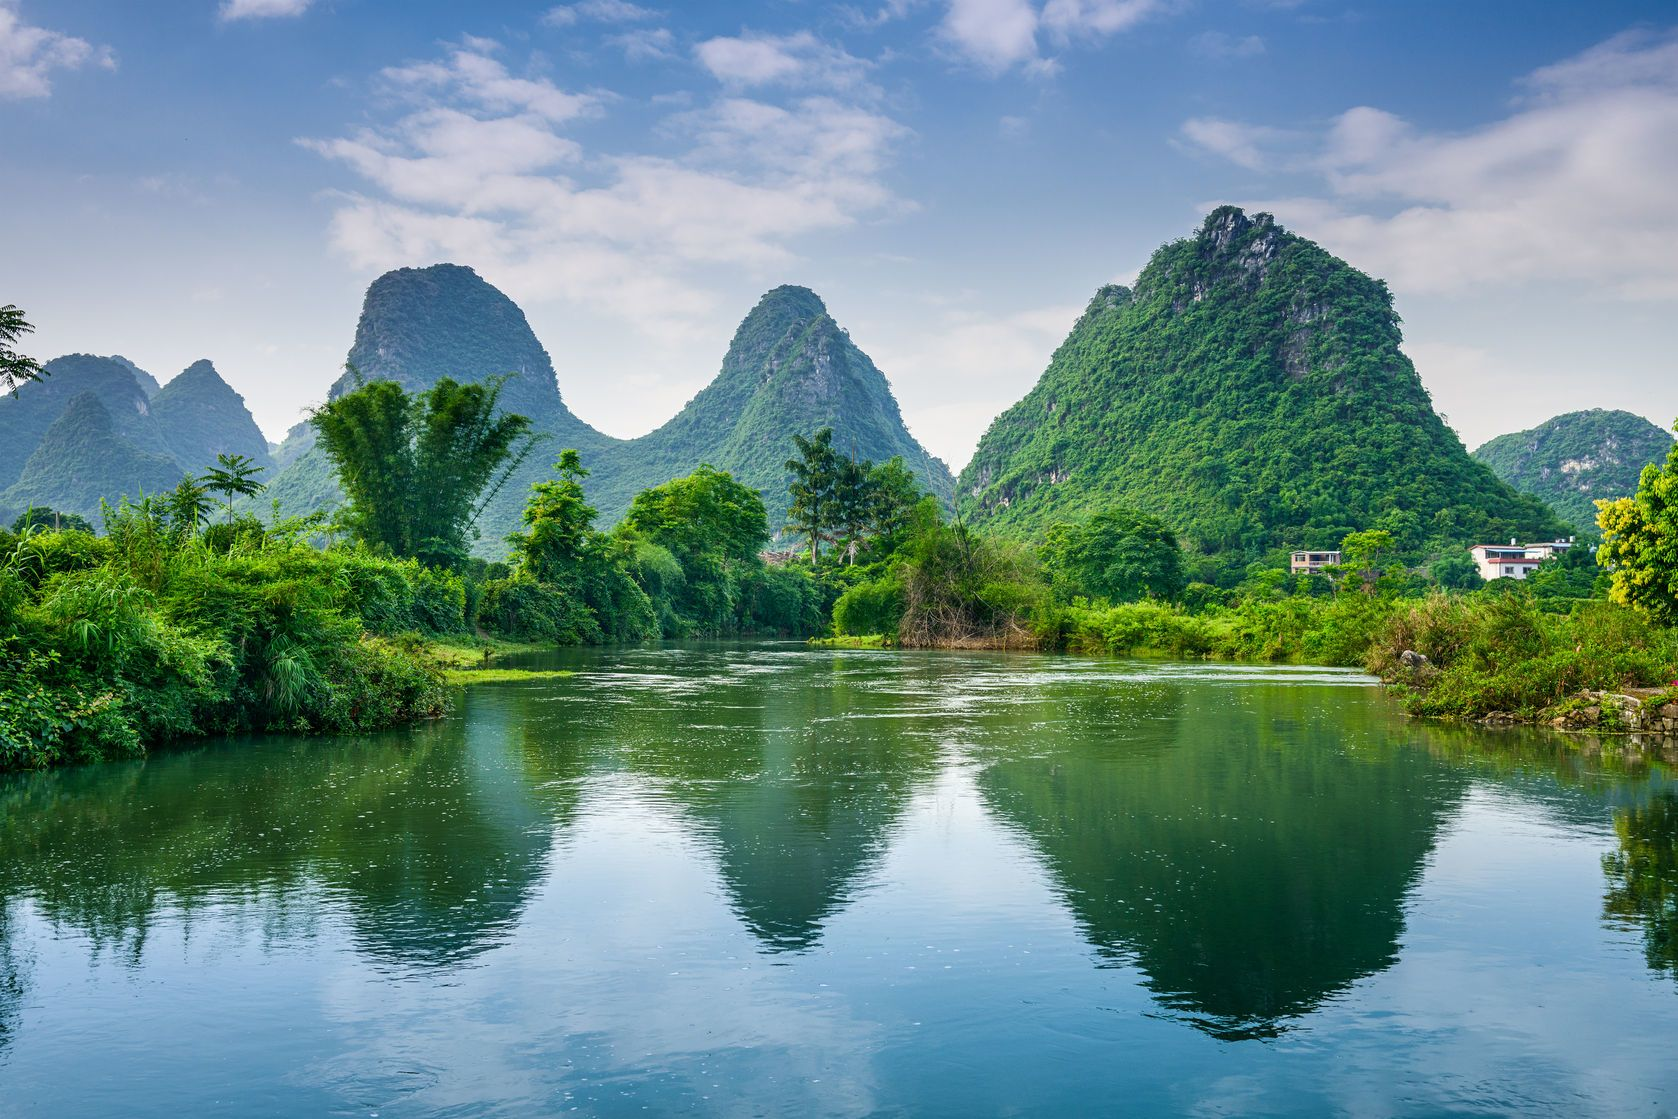 Horská krajina v oblasti Guilin v Číně | sepavo/123RF.com